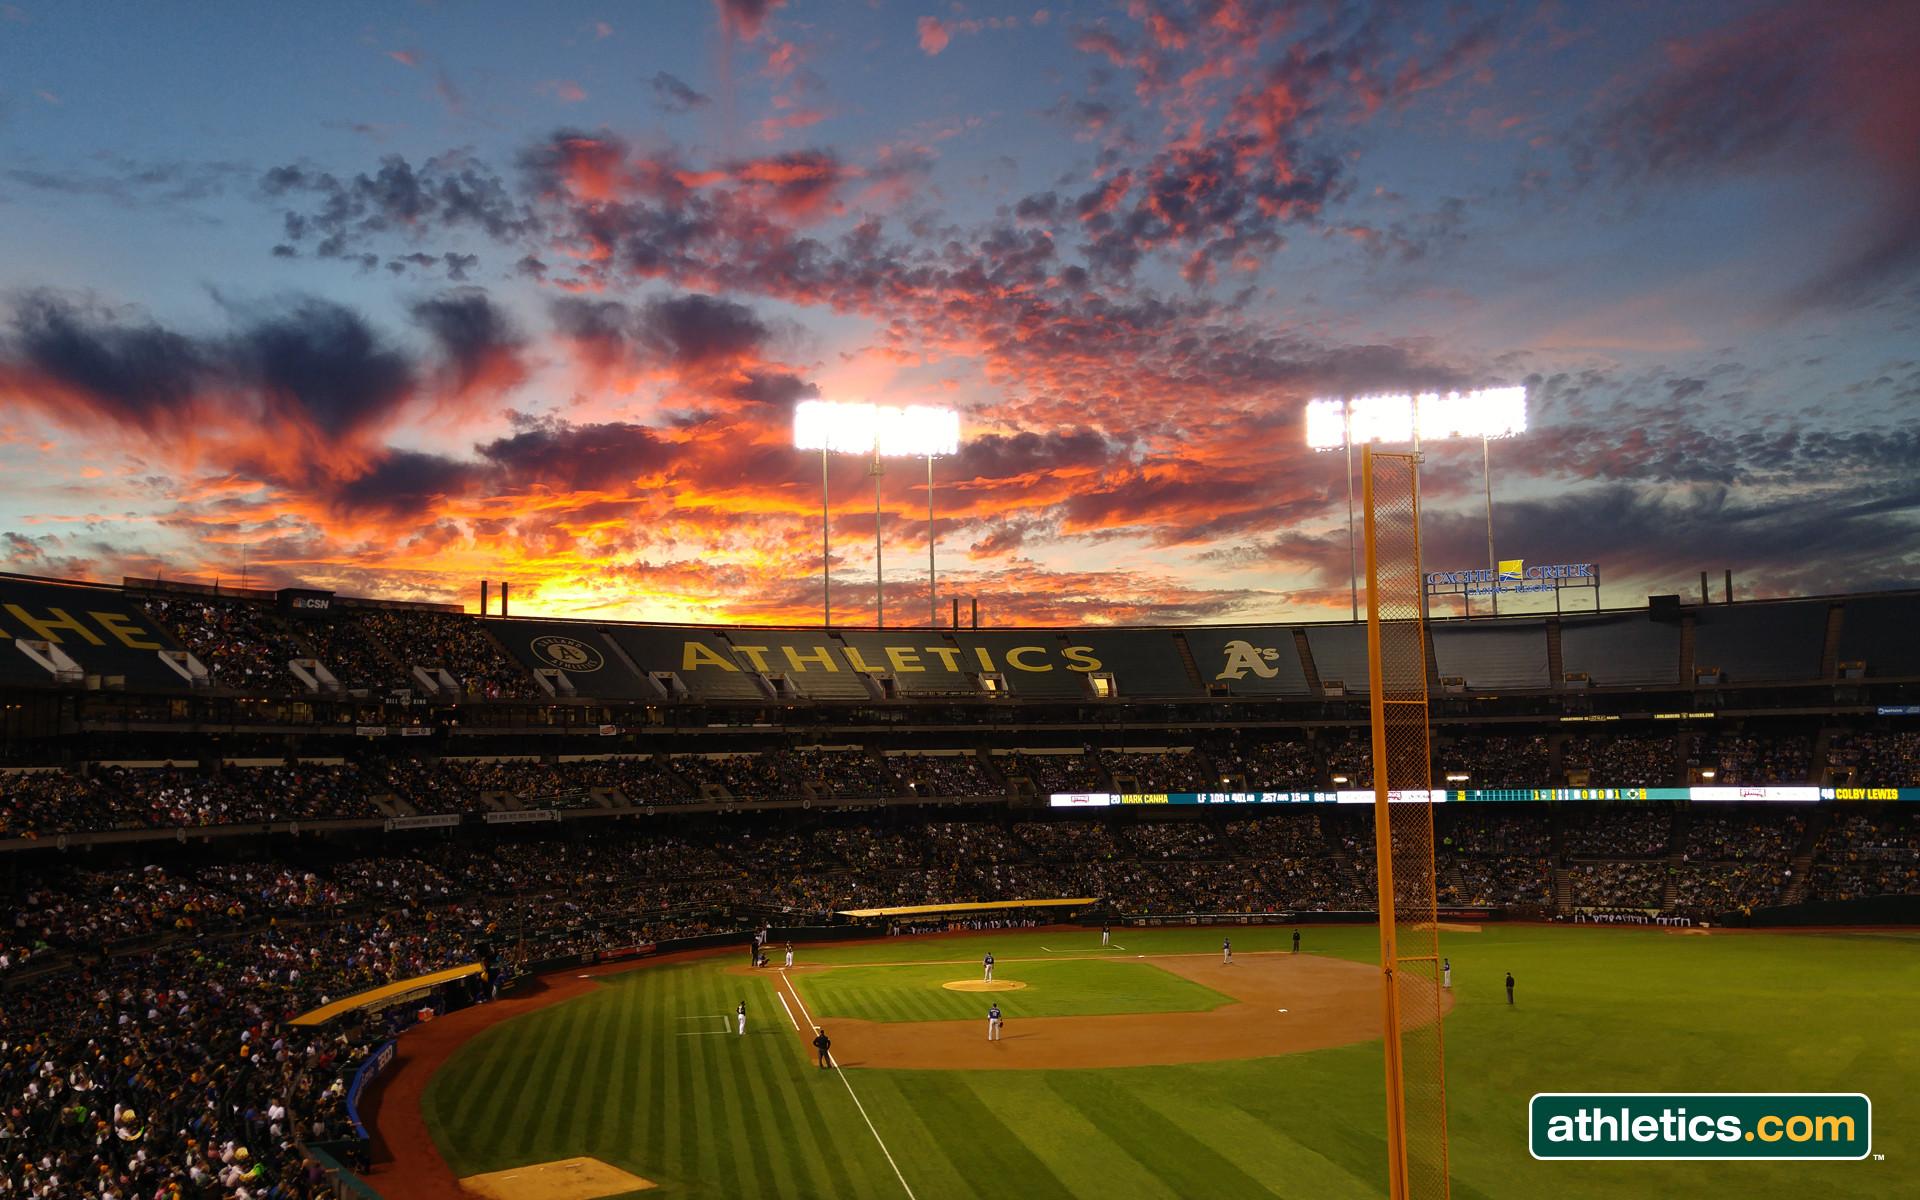 Ballpark Sunset. Download 1024×768 version » · Download version »